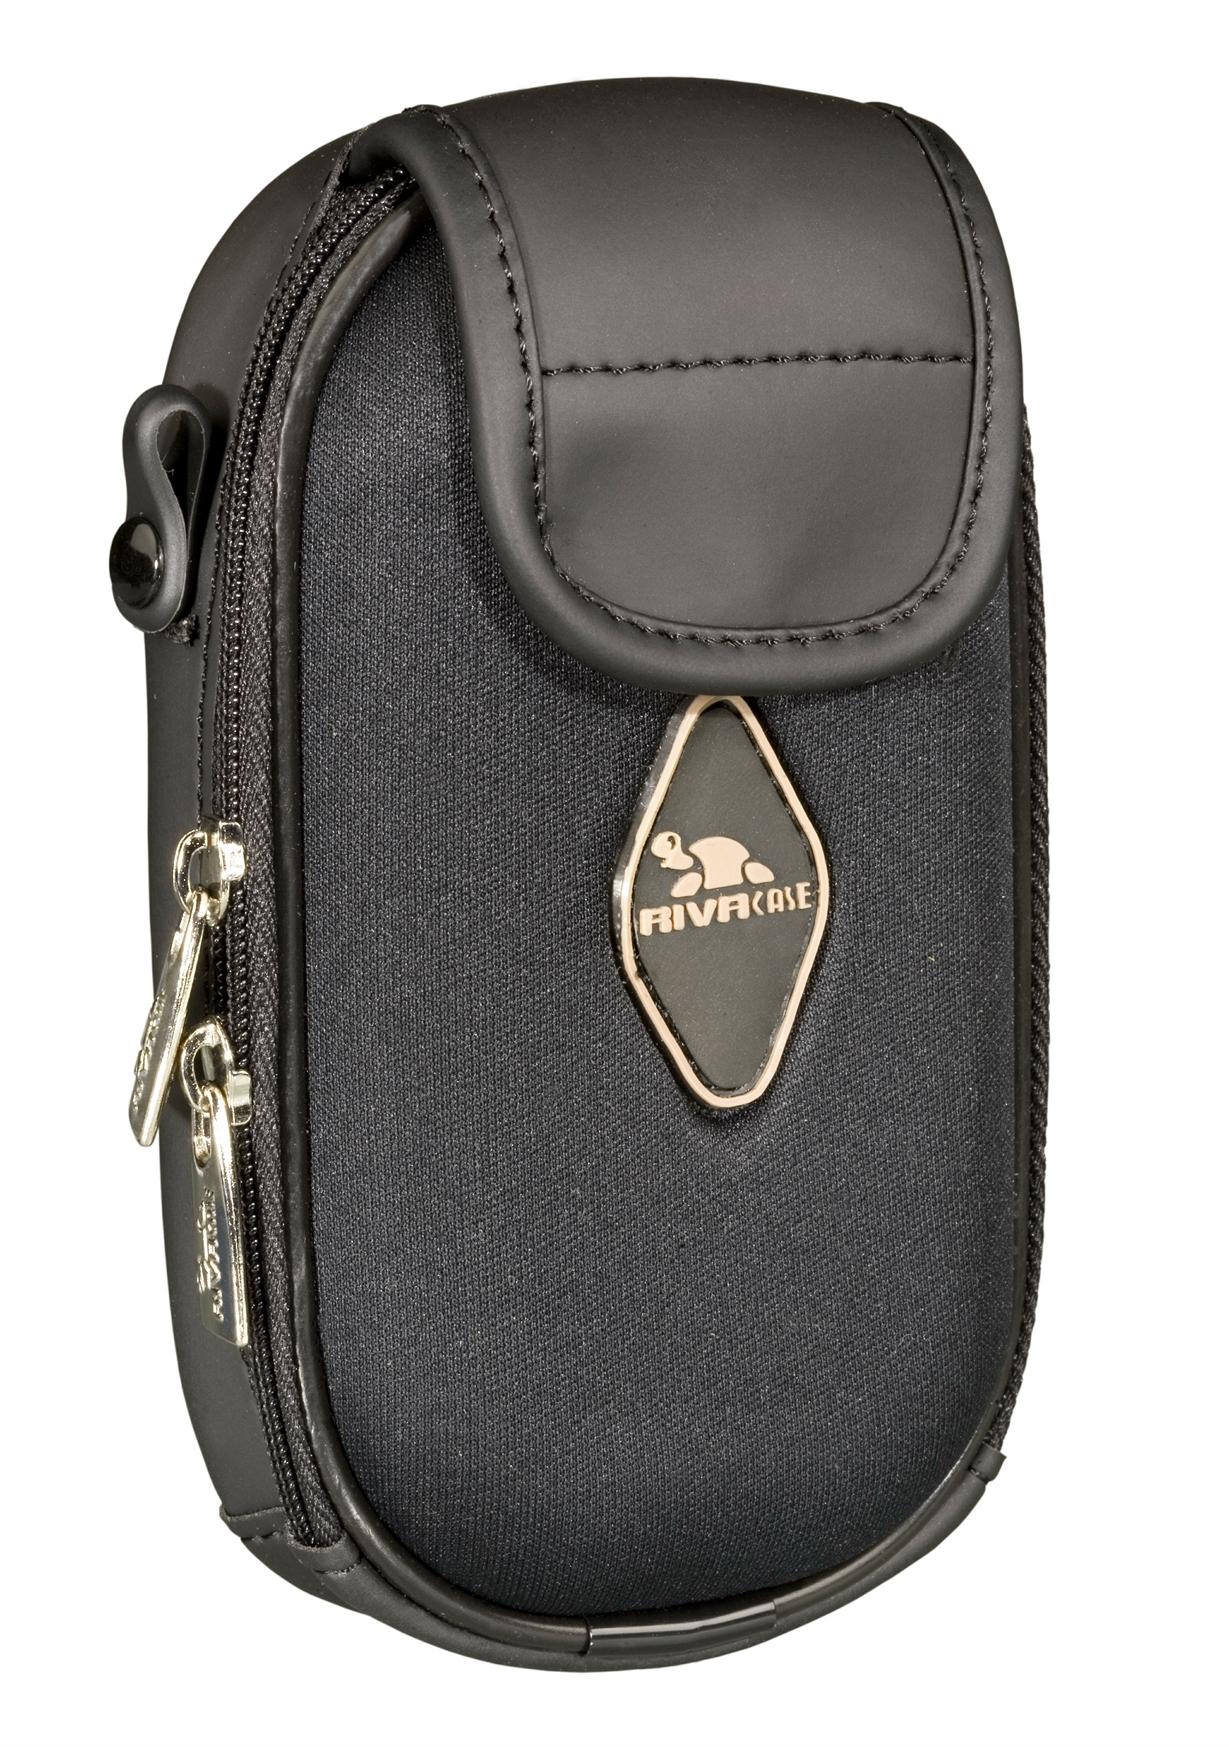 Сумка для фотоаппарата Riva case Real Brand Technics 189.000